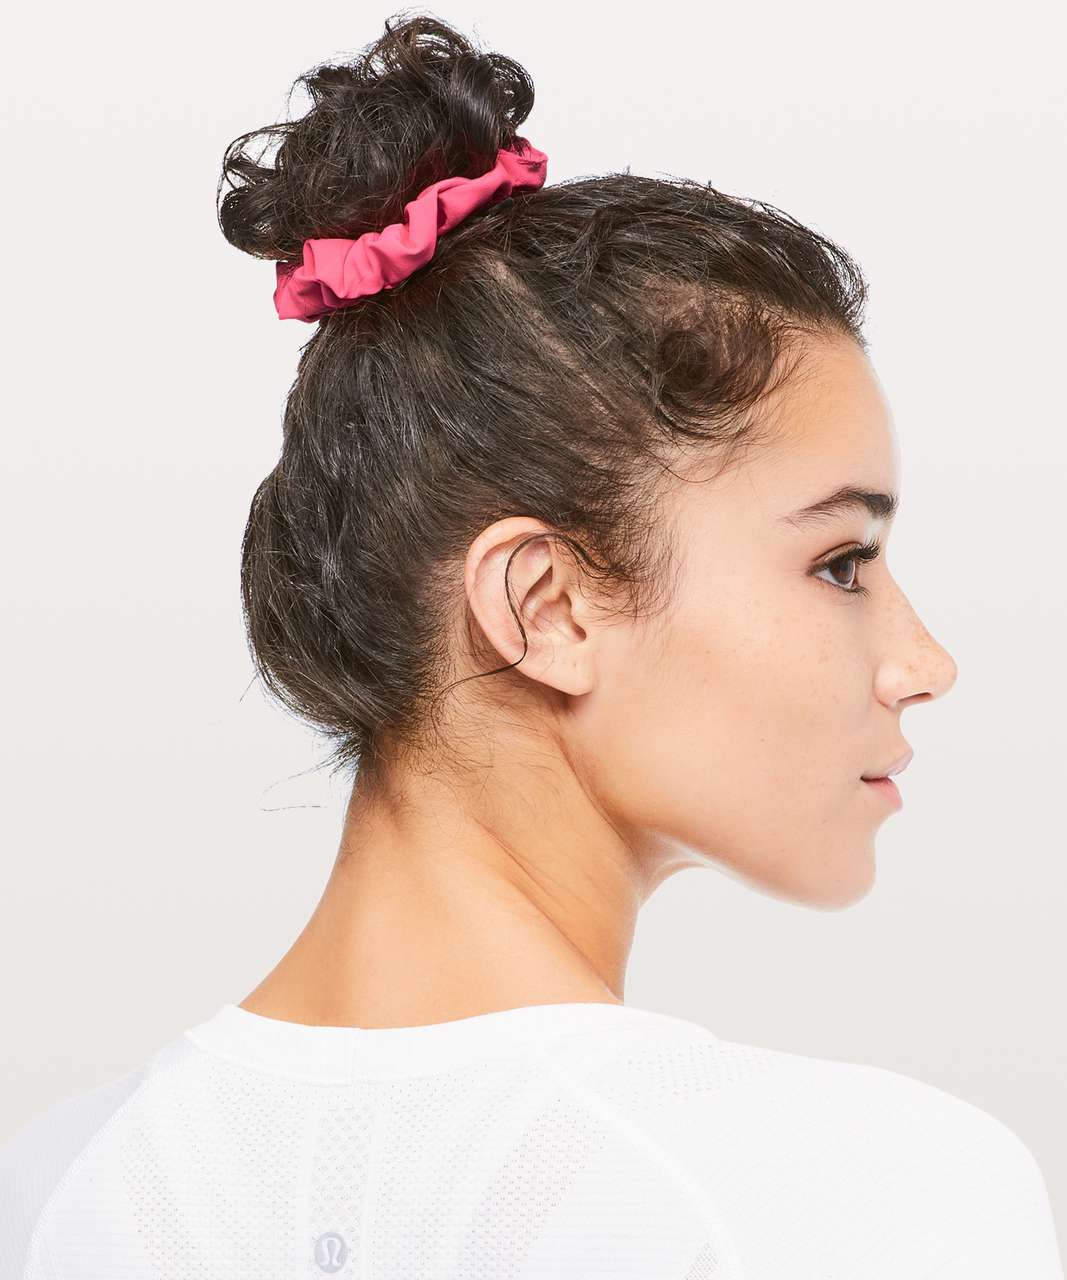 Lululemon Uplifting Scrunchie - Neon Pink